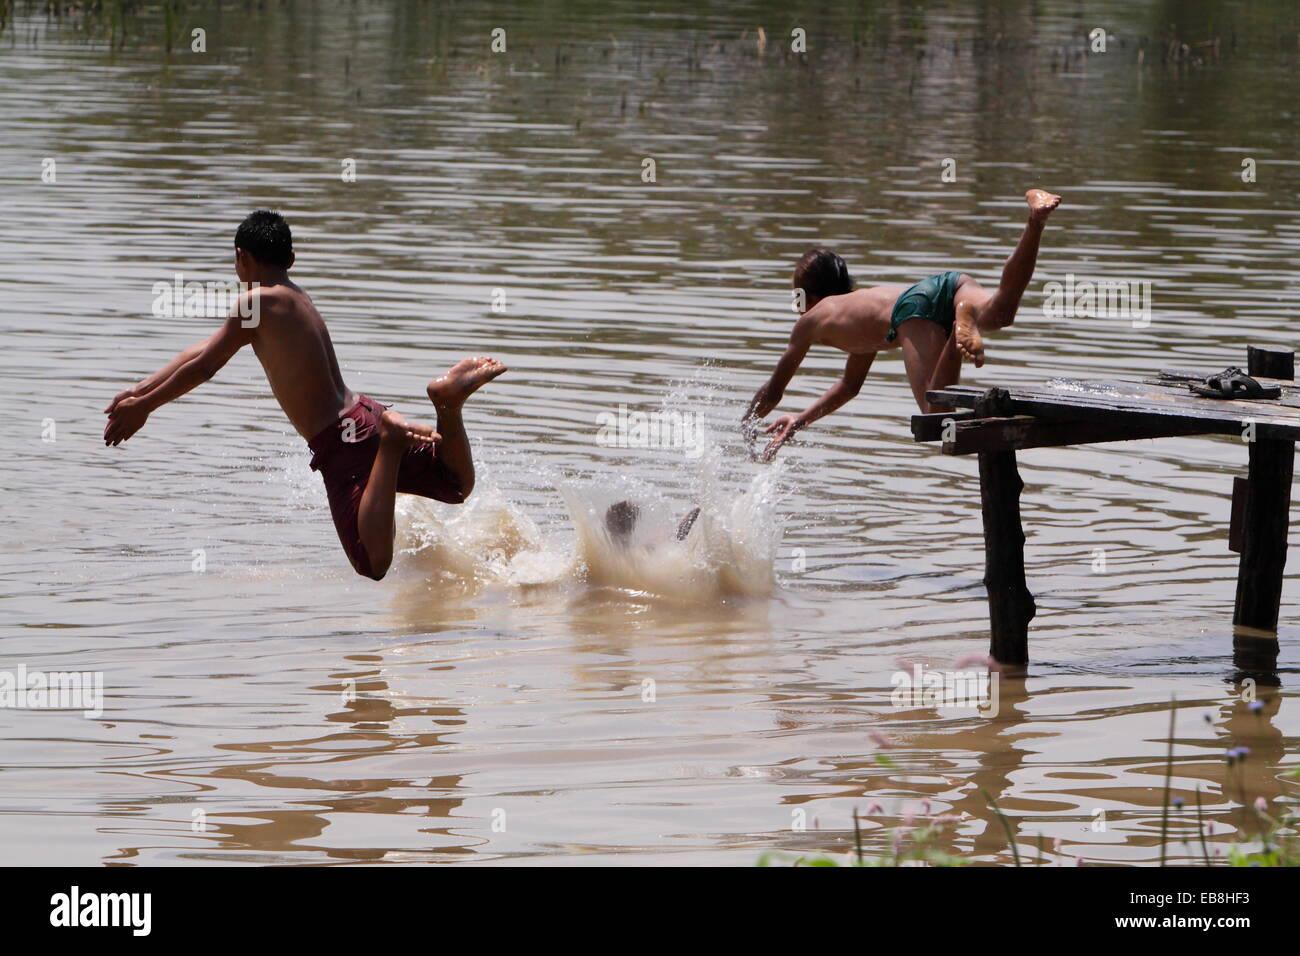 boy swimming river - photo #7